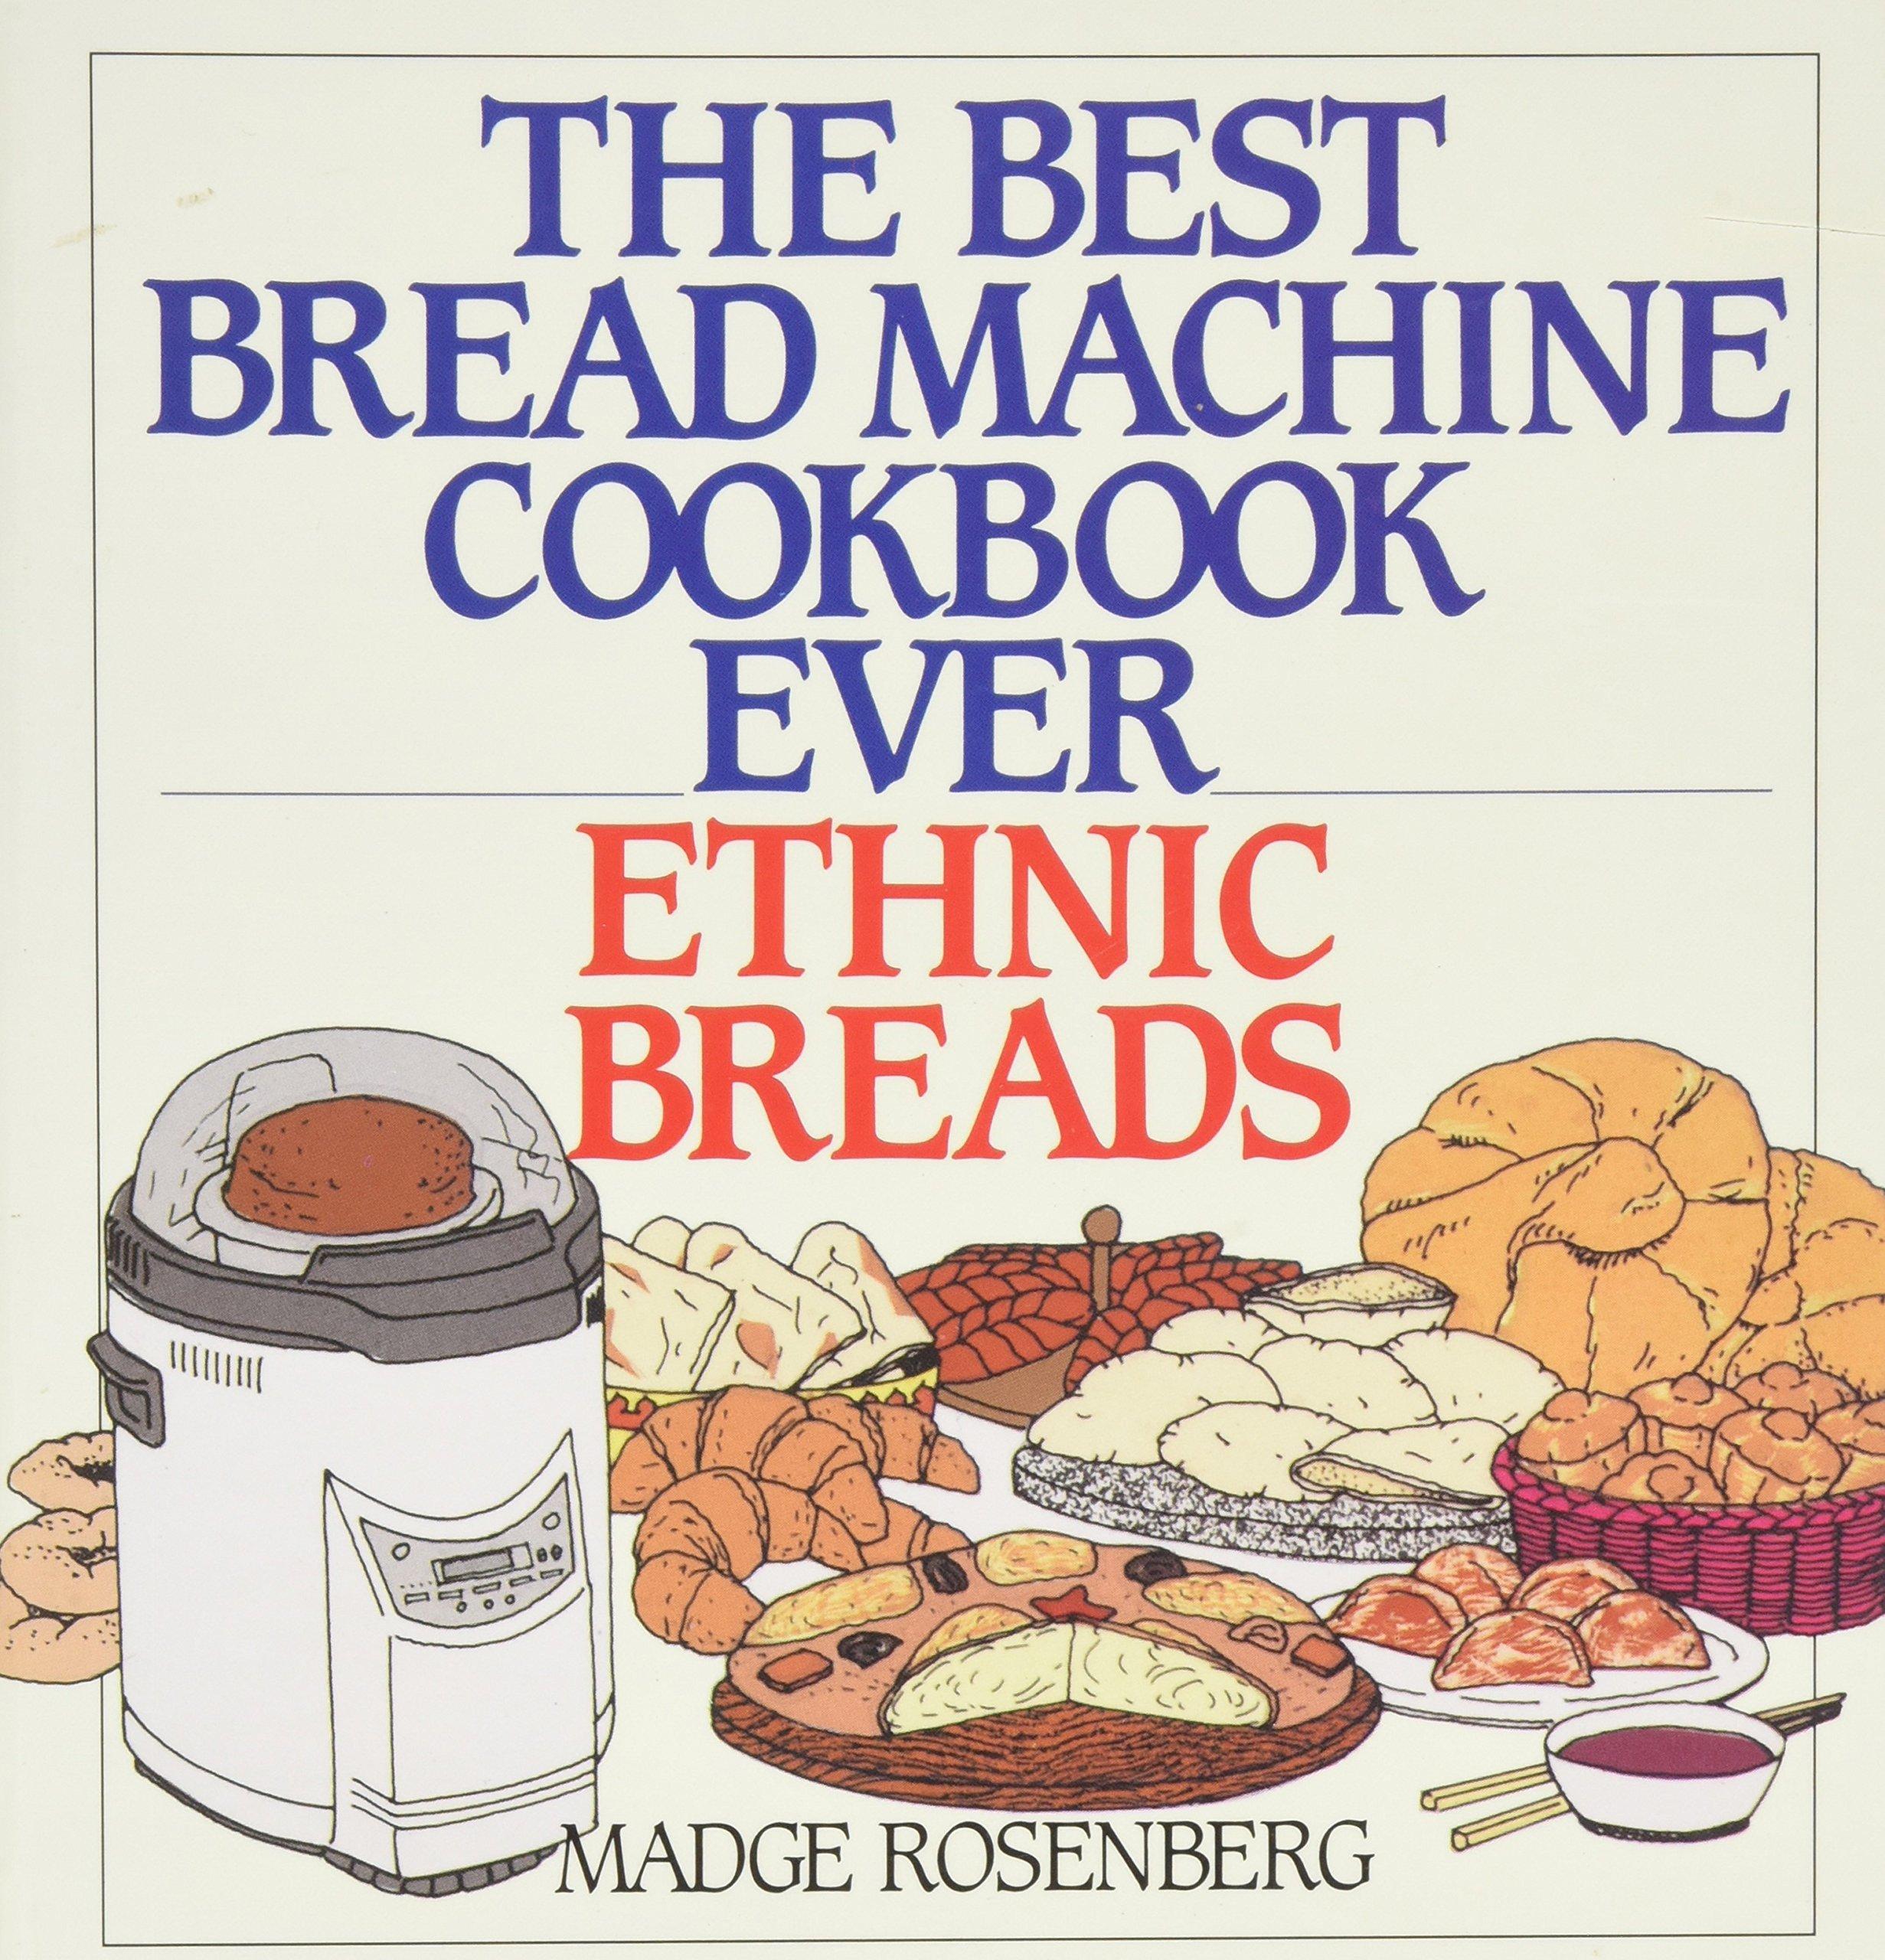 The Best Bread Machine Cookbook Ever Ethnic Breads Madge Rosenberg 9780060170936 Amazon Com Books